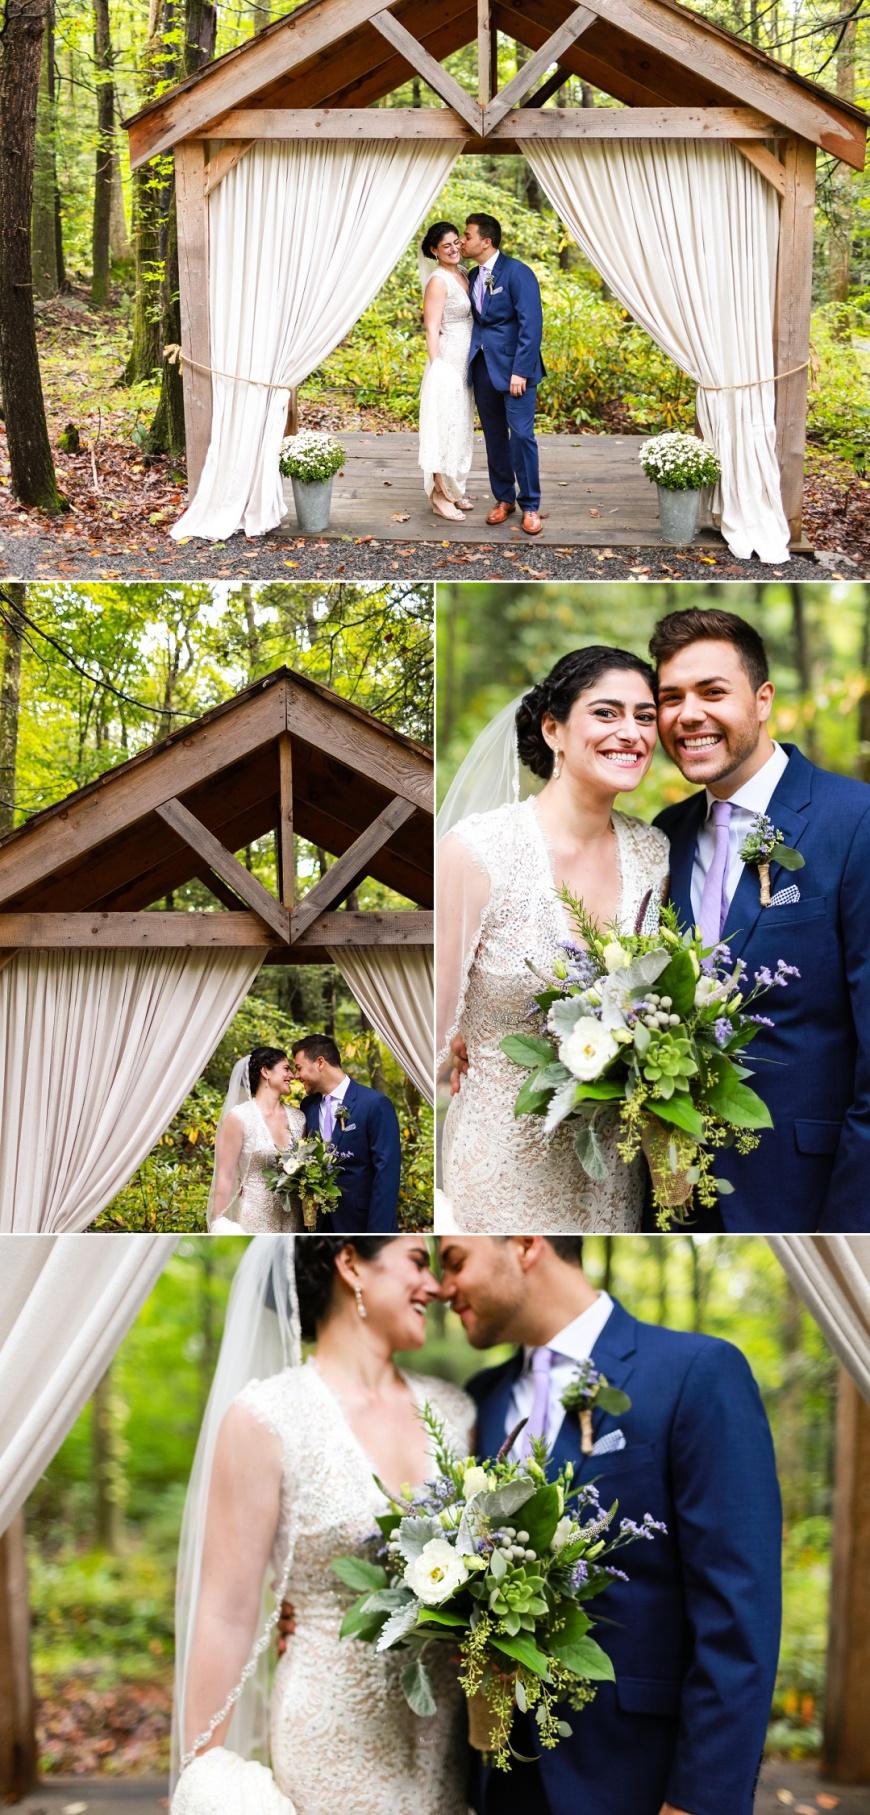 Tall-Timber-Barn-Poconos-Wedding-Photographer_1043.jpg